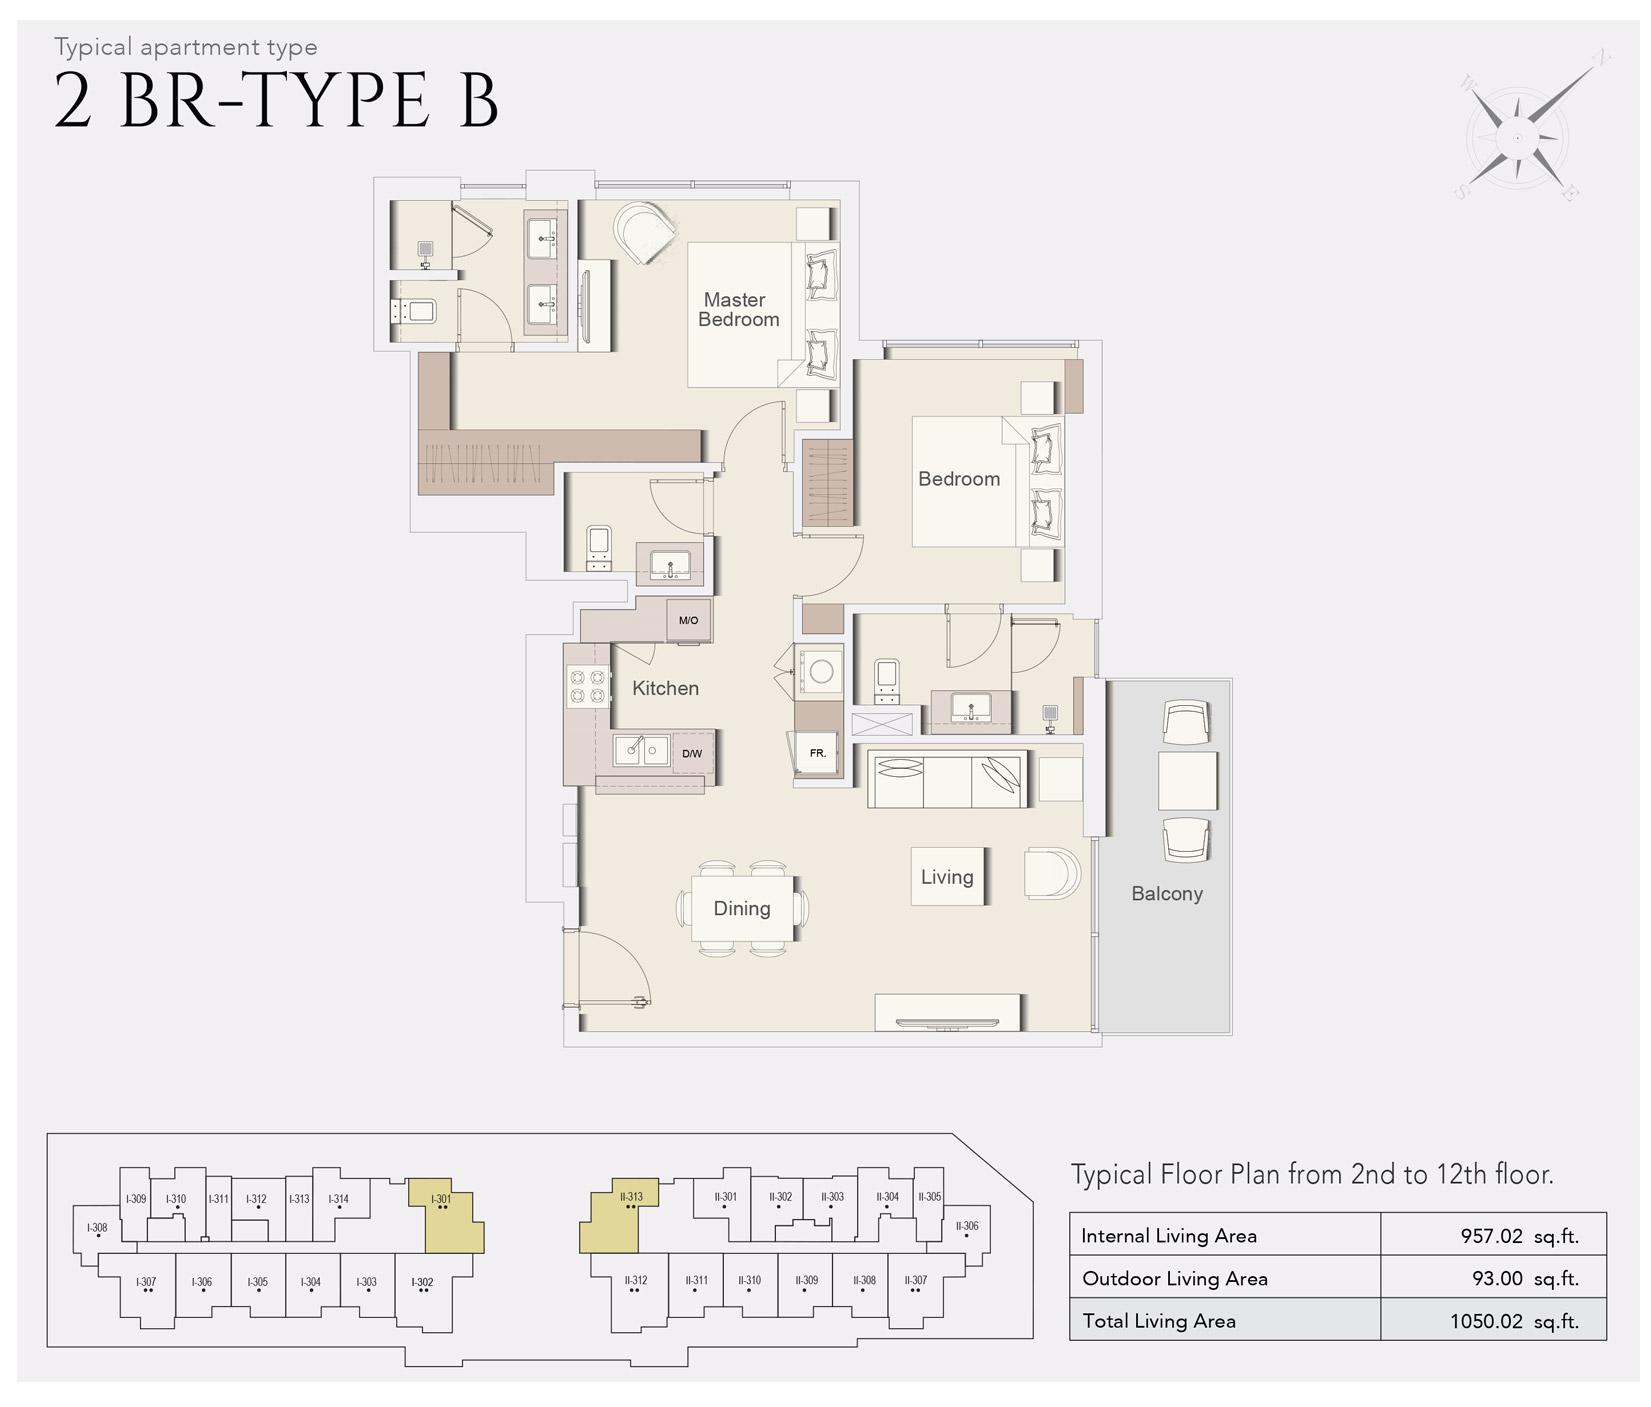 غرفتي نوم، نوع B، حجم 1050 قدم مربع